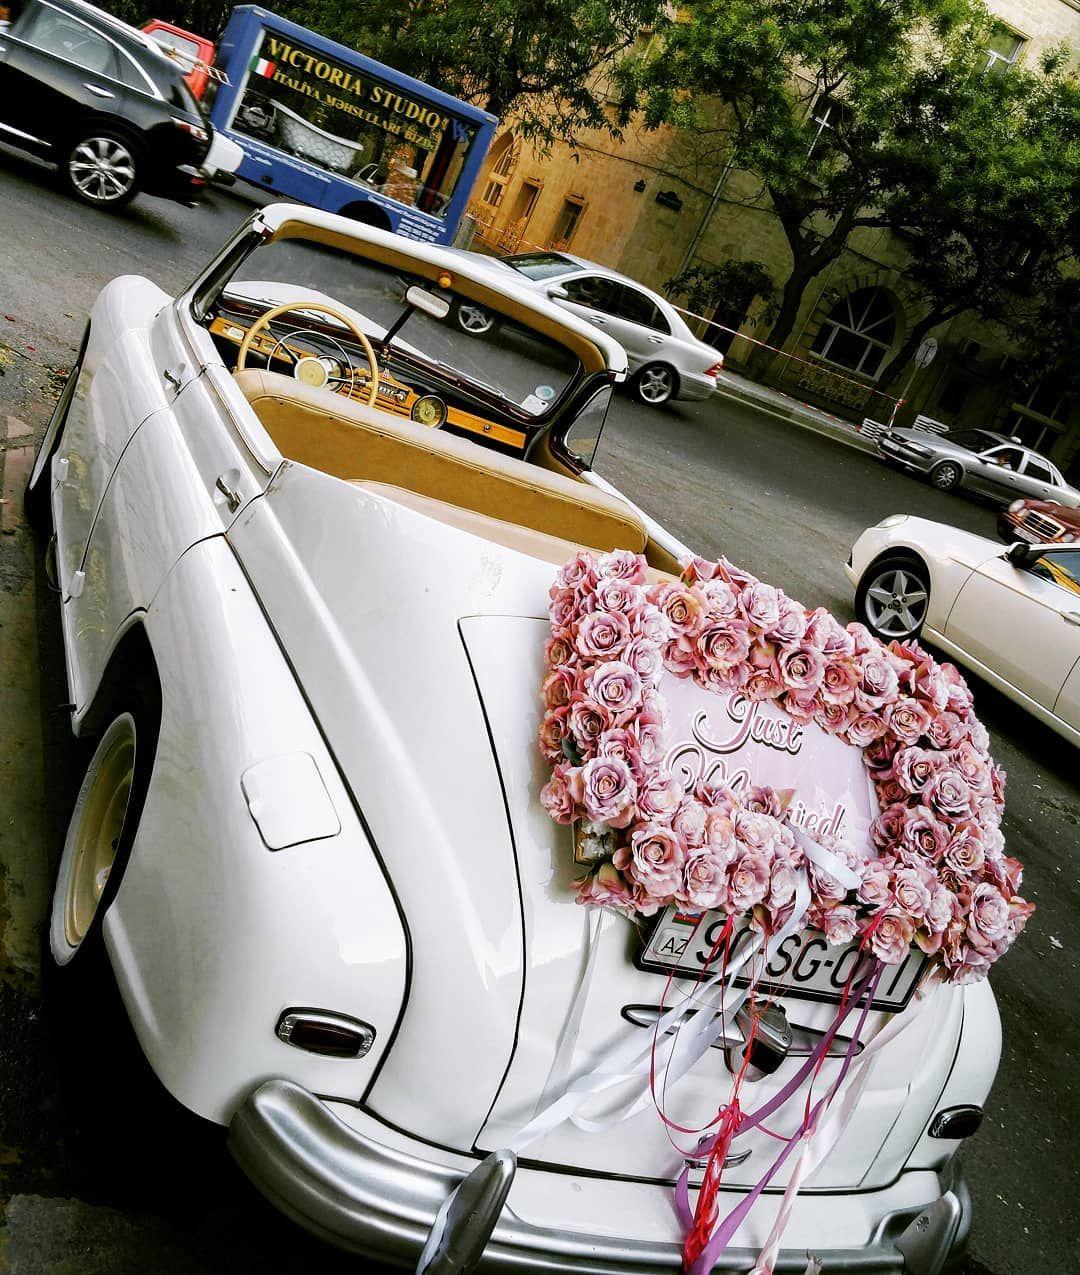 classic car summerstyle hotroad hotwheels whitecar